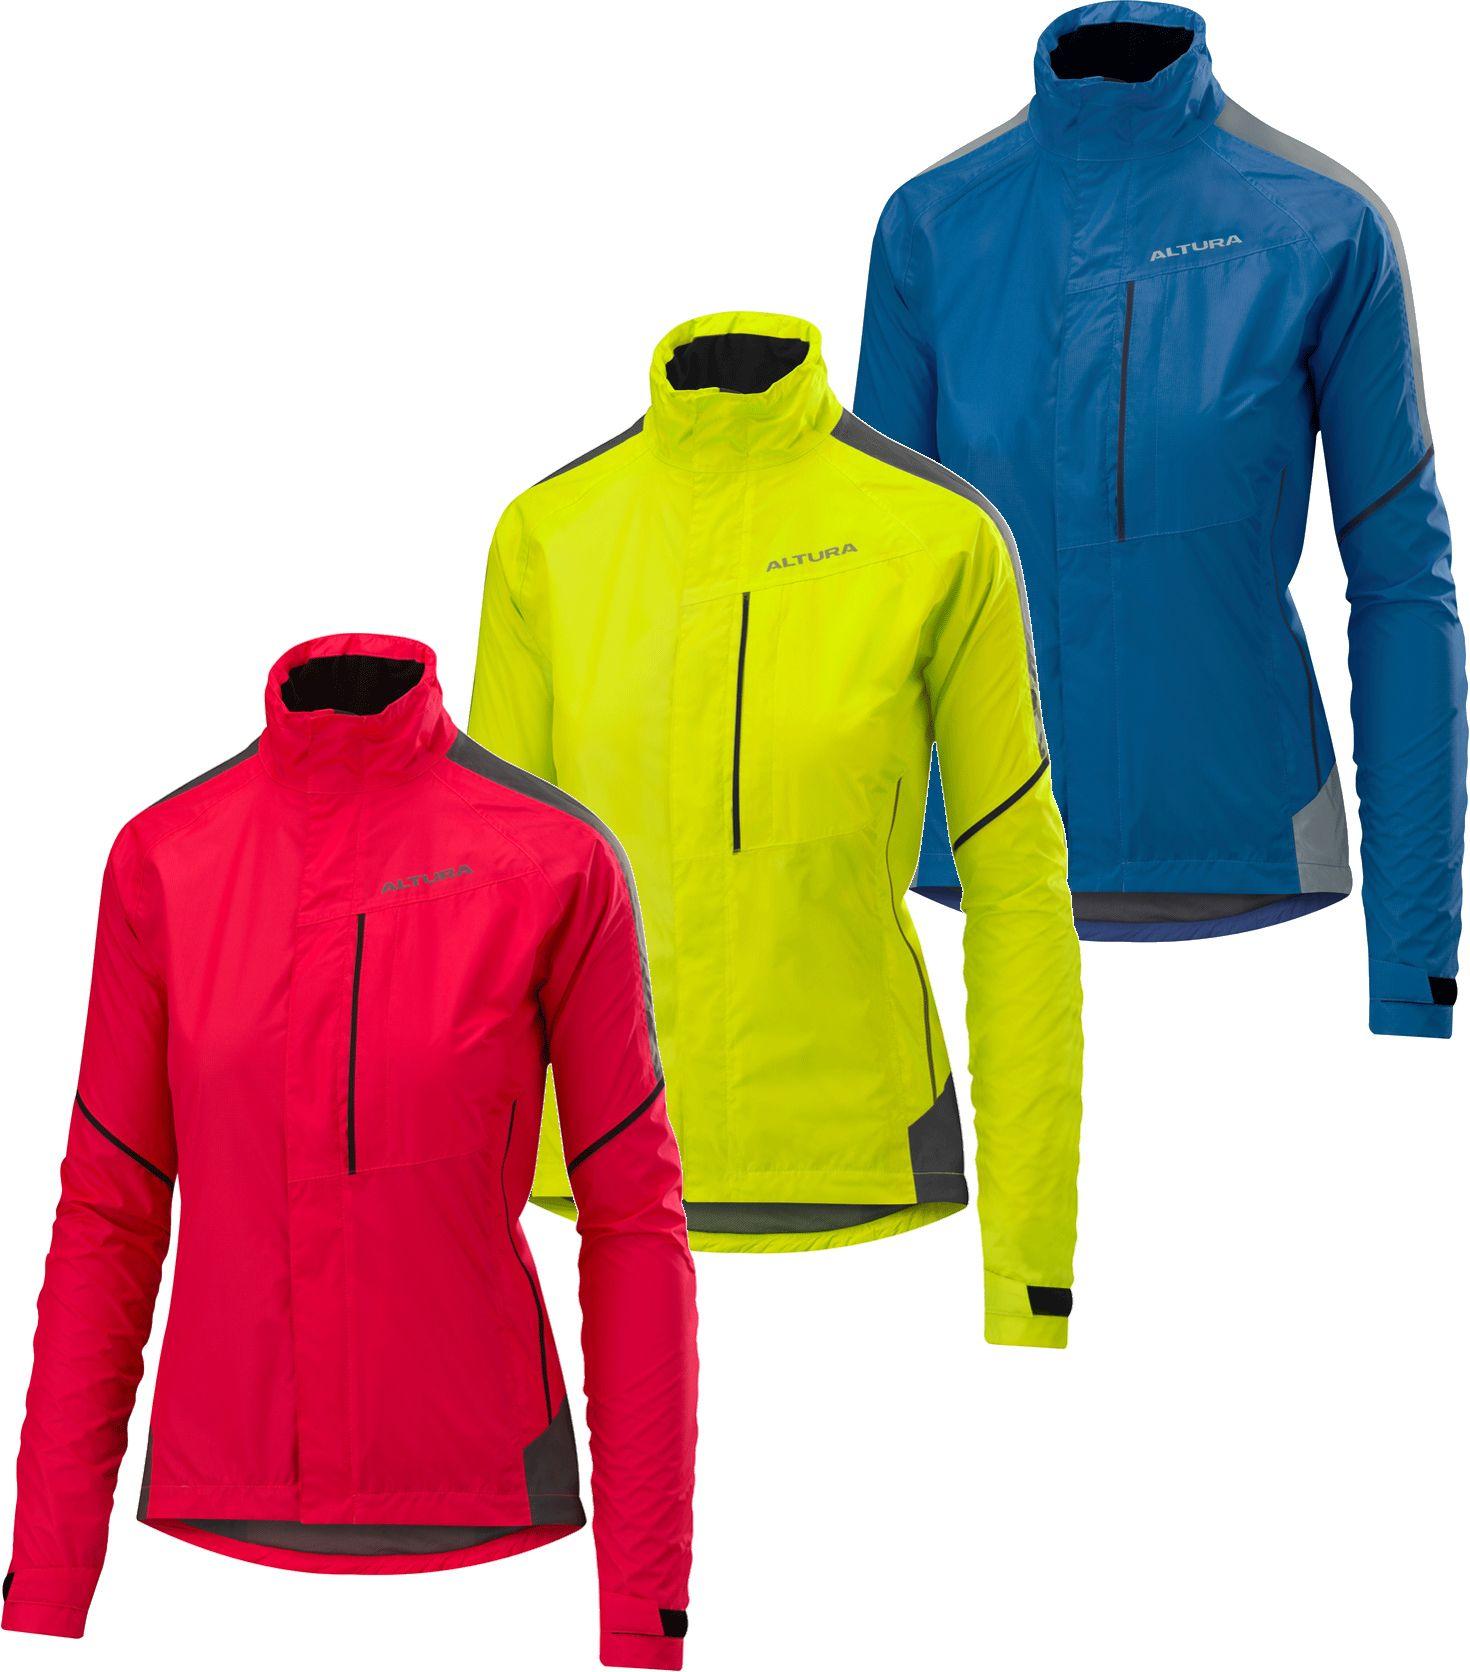 Altura - Nightvision Twilight | cycling jacket